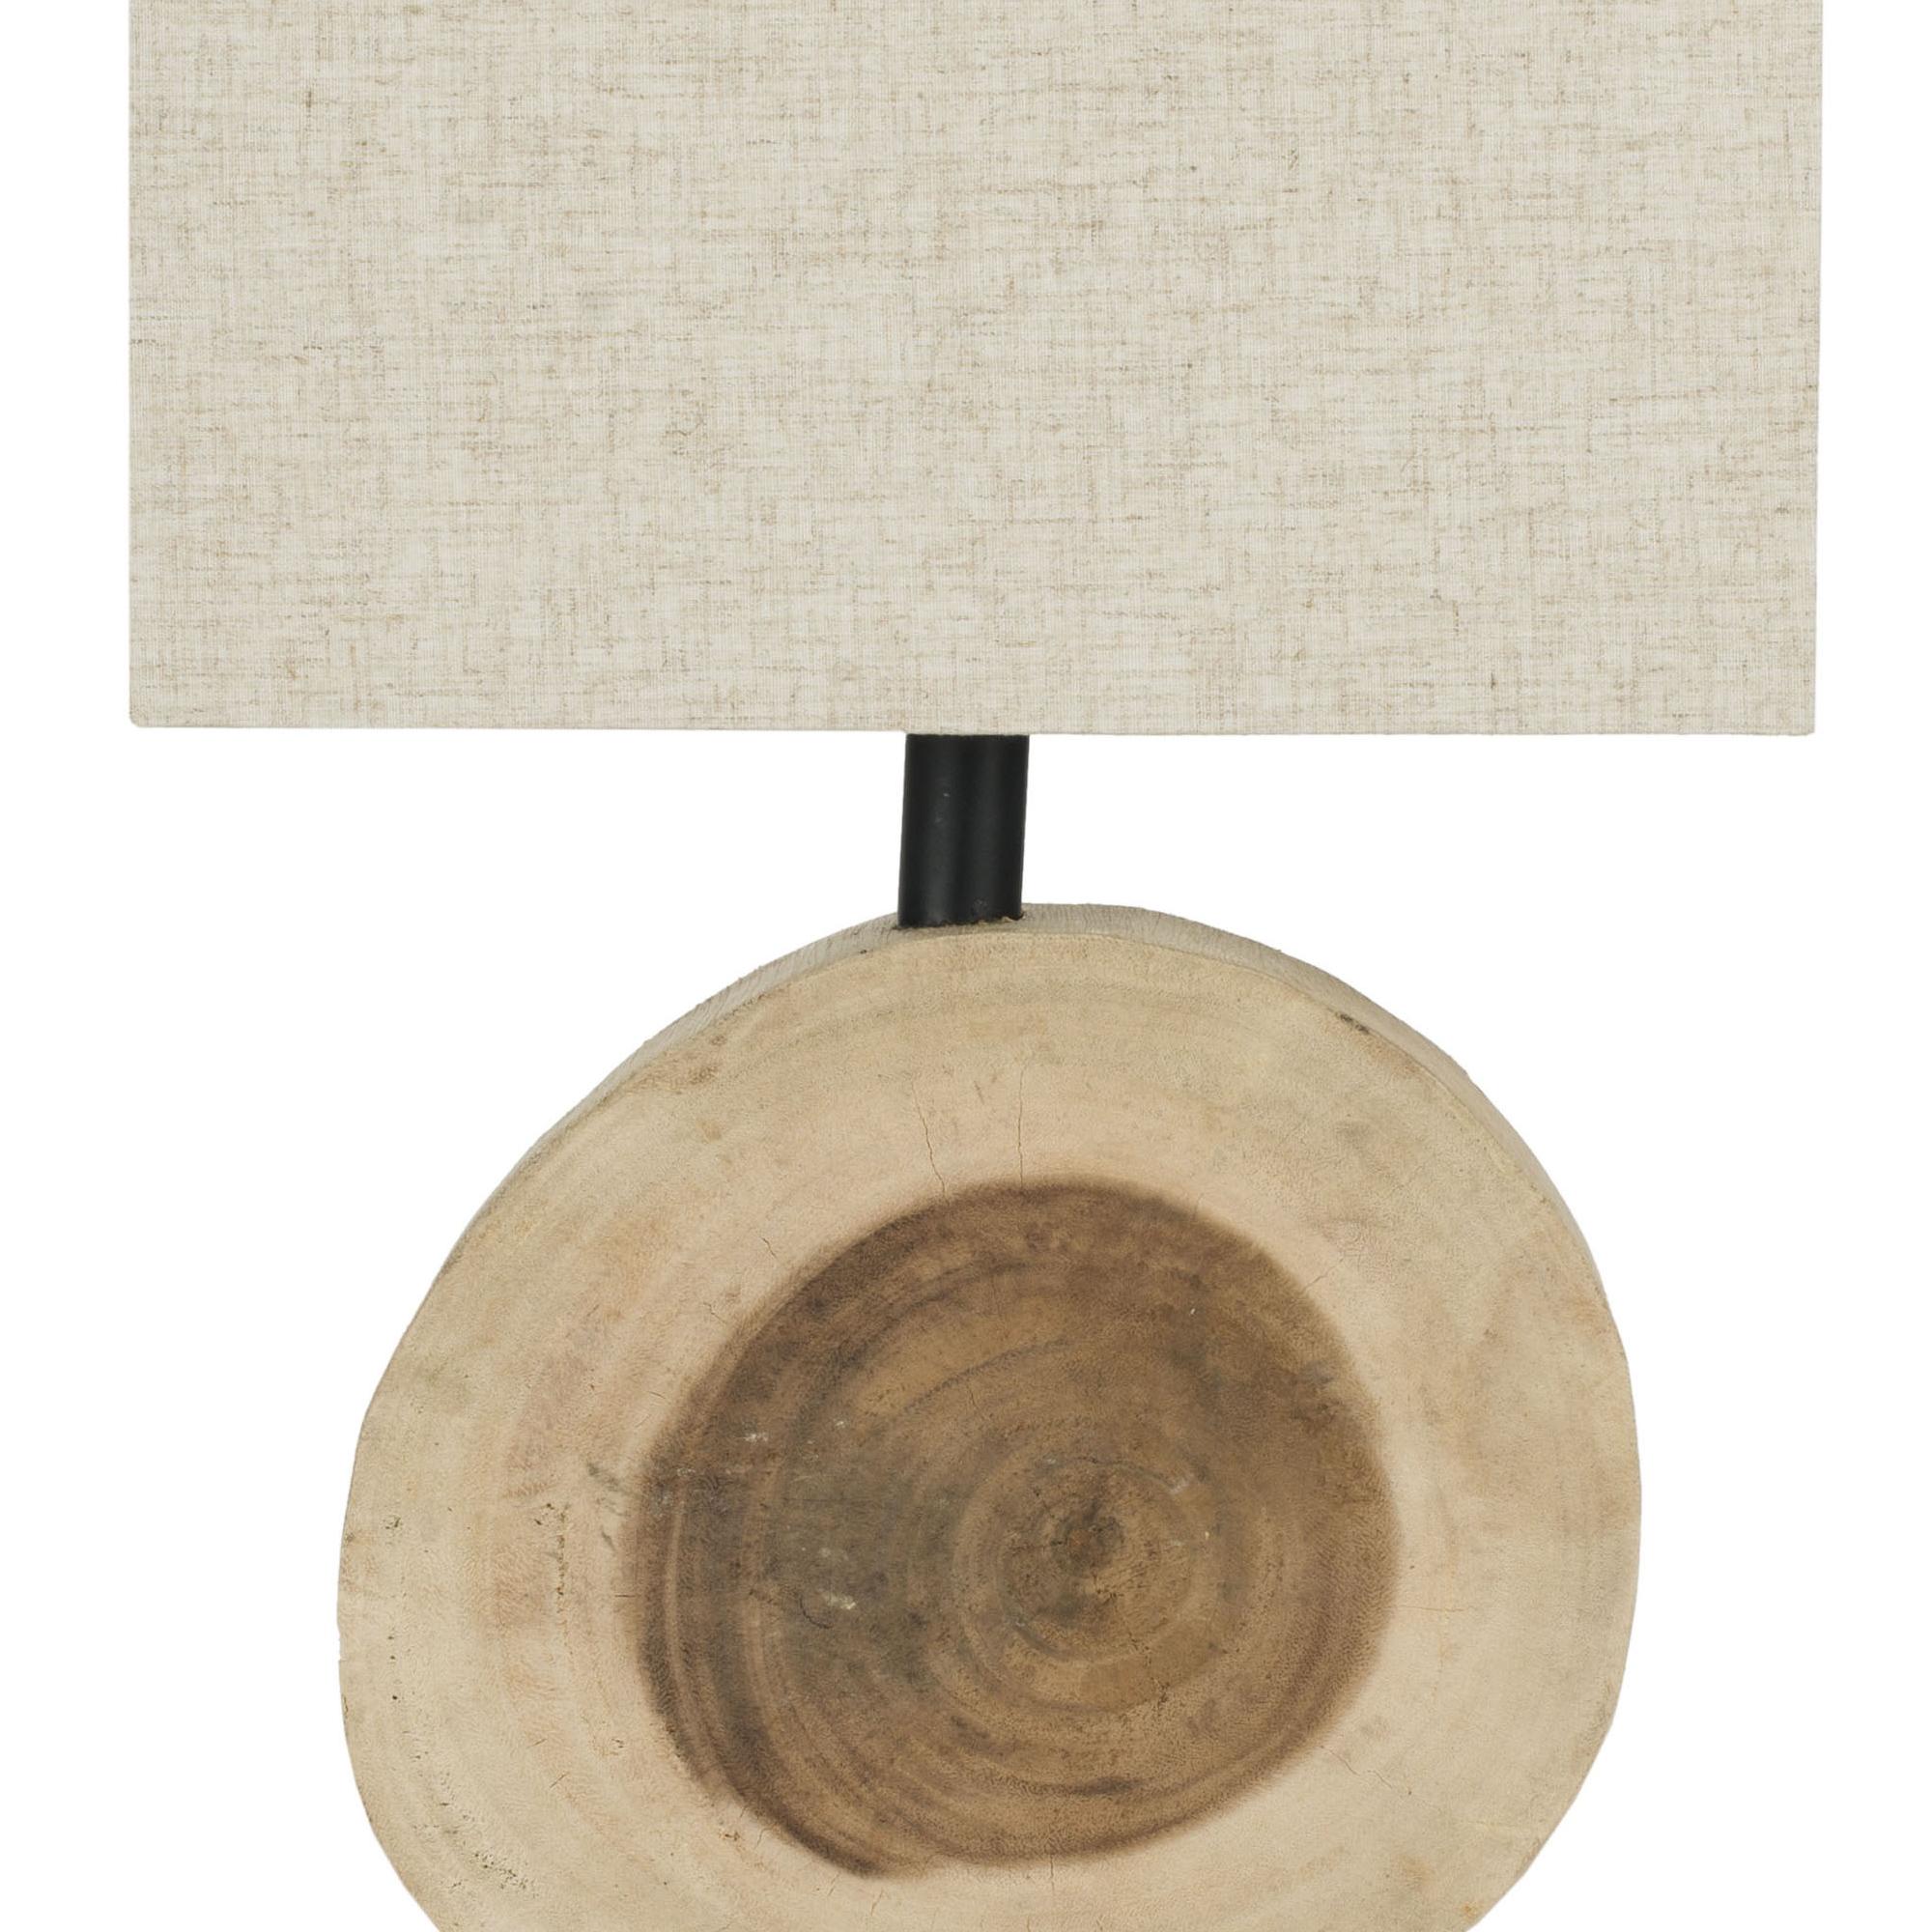 Safavieh-Forester-Natural-Wood-Indoor-Lamp-437ea3ac-cd35-413b-8ba8-7a71e554c587